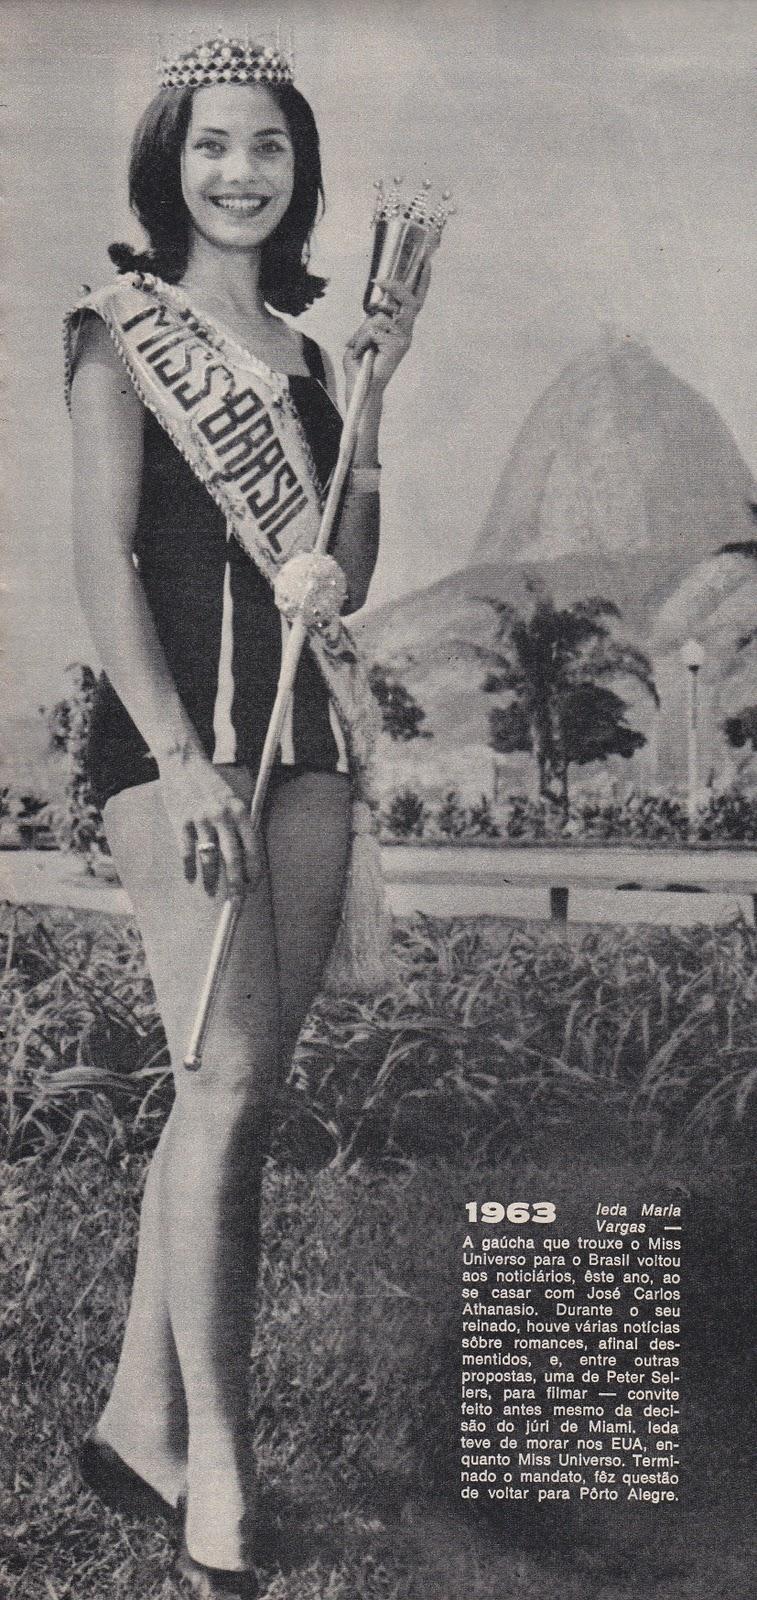 ieda maria vargas, miss universe 1963. Missbr10